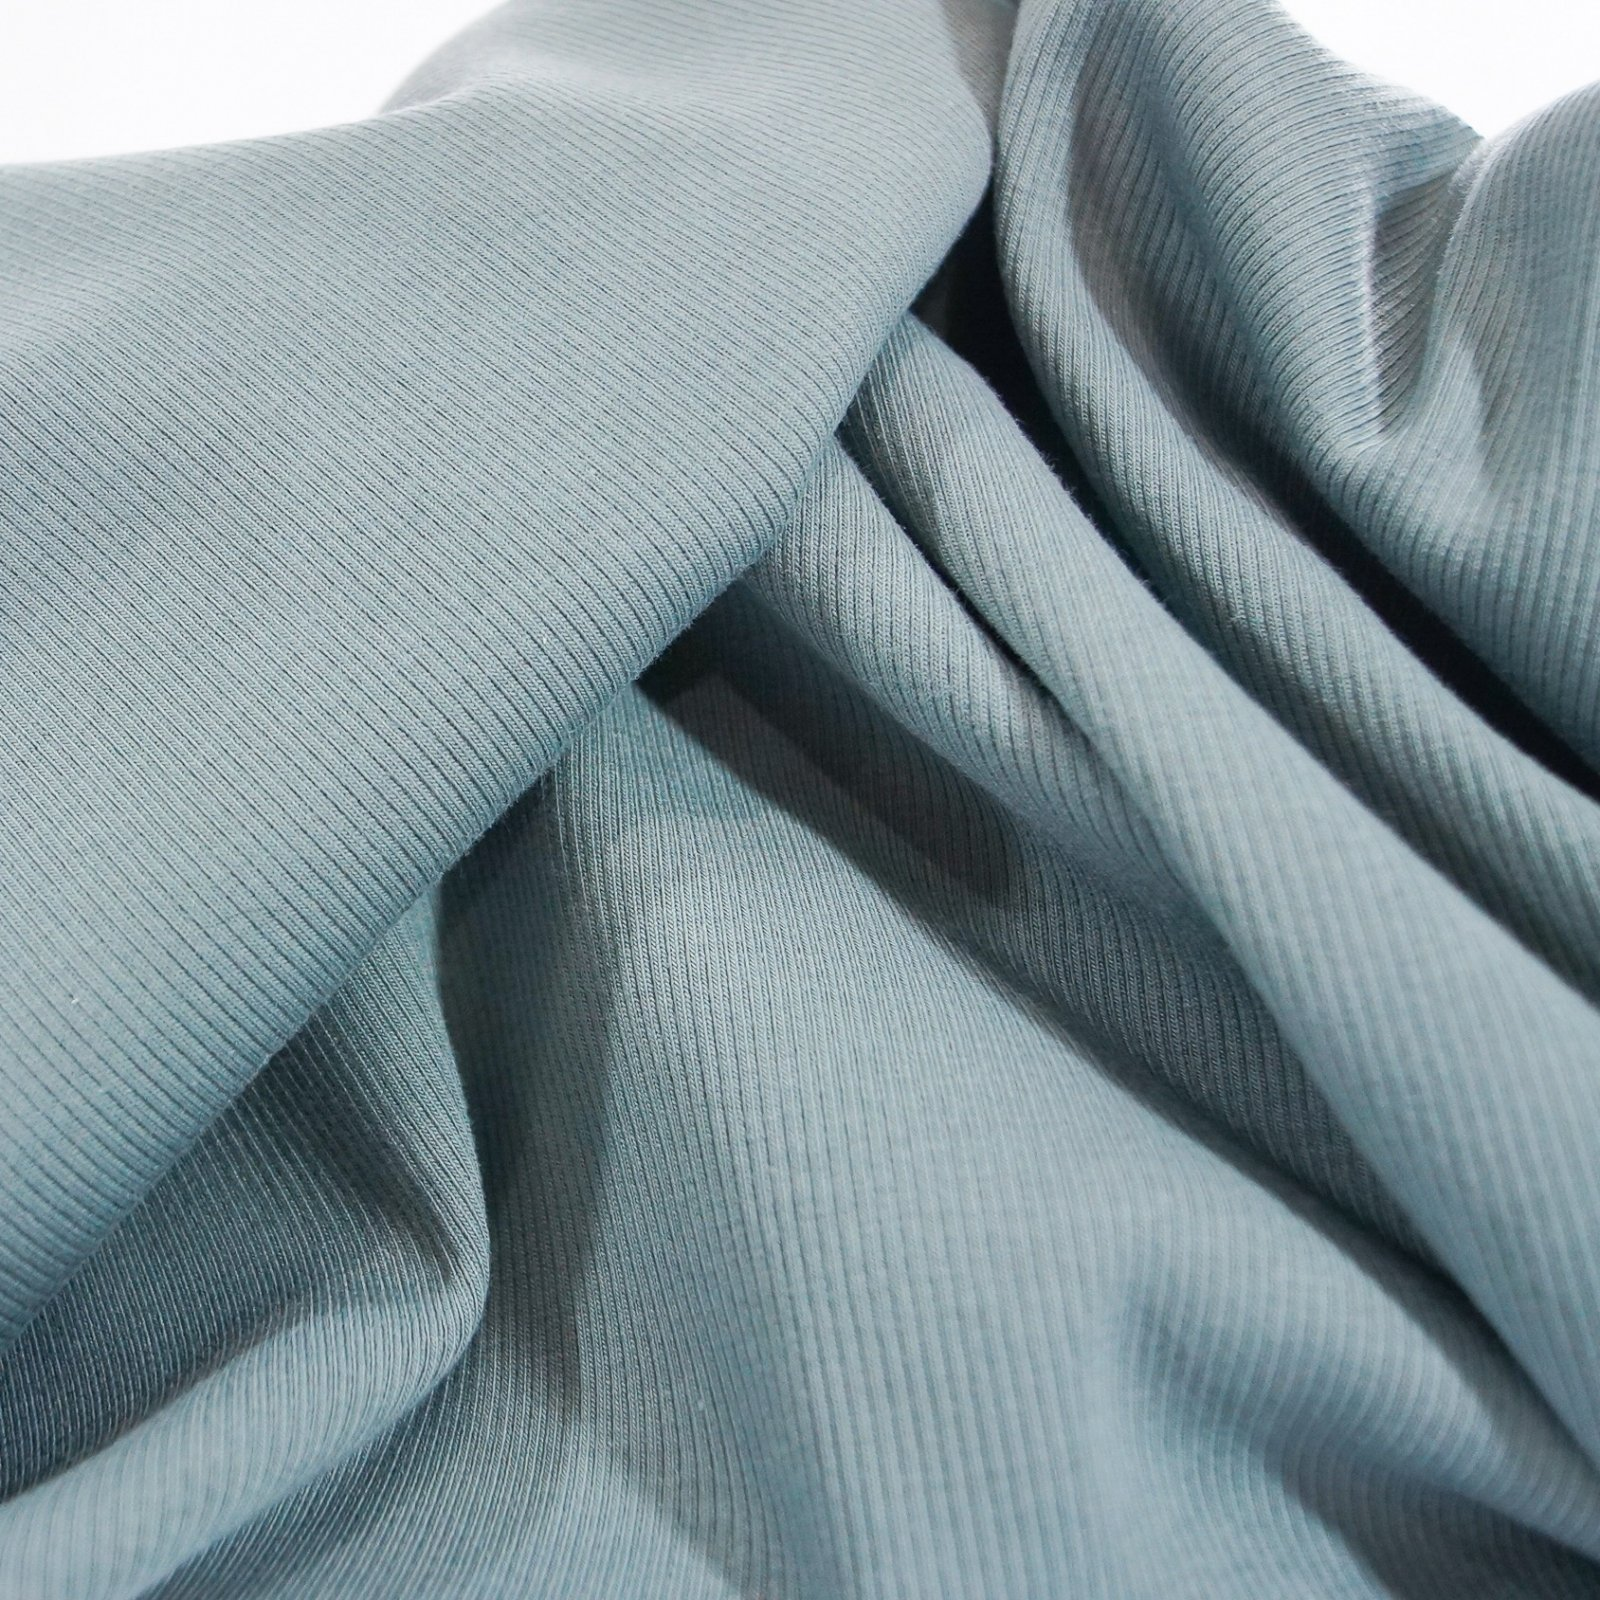 Rib Knit - 2 x 1 -  Organic Spruce